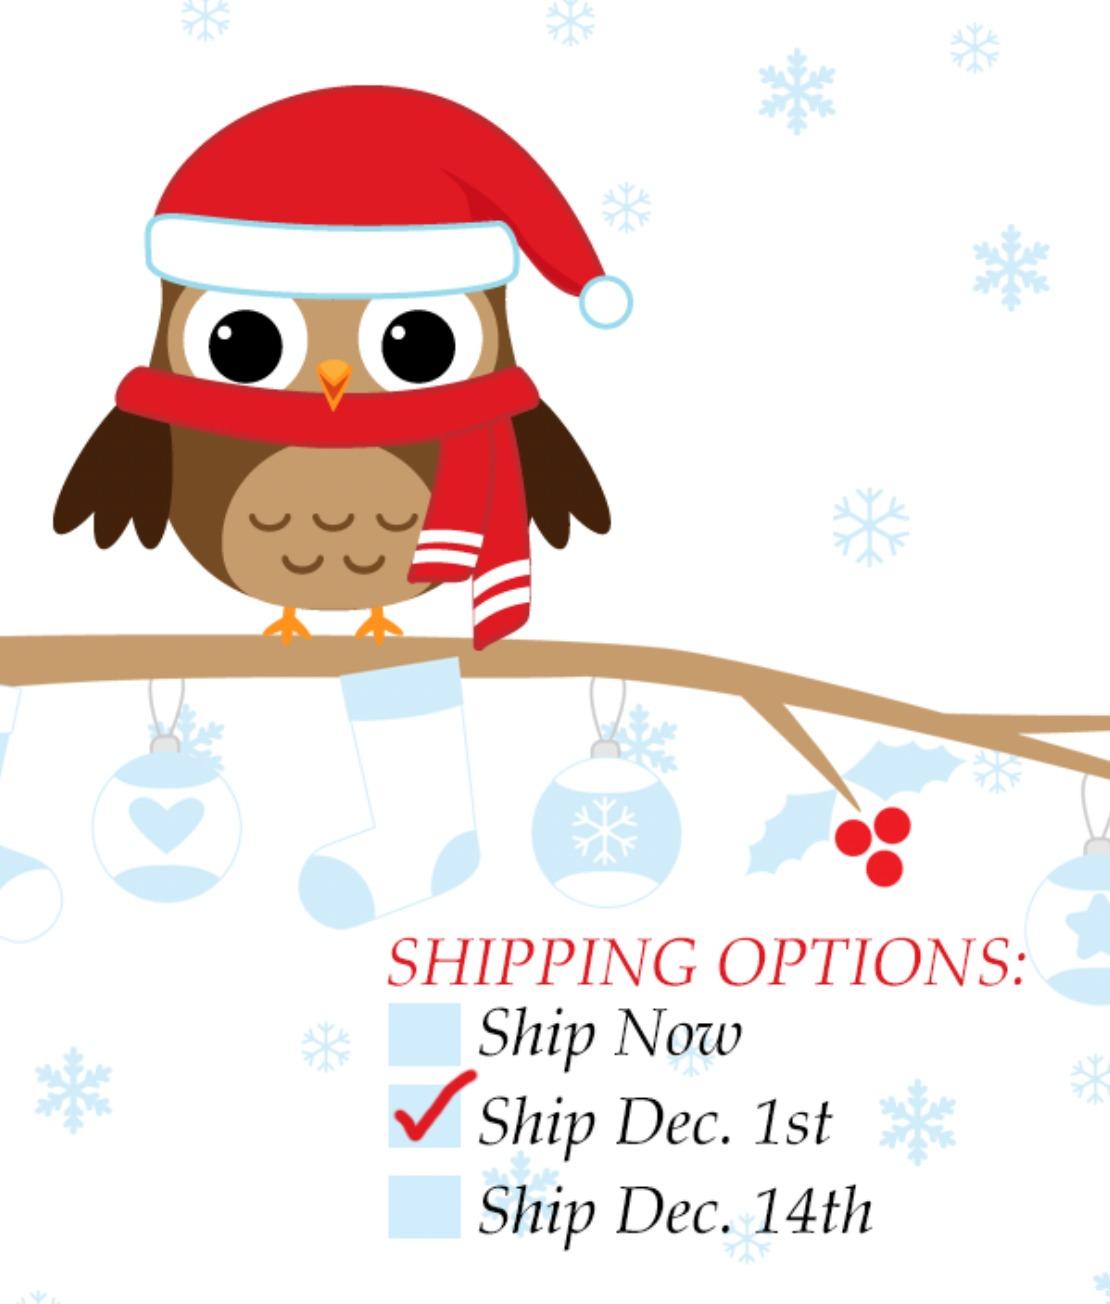 Shopnow for Christmas...